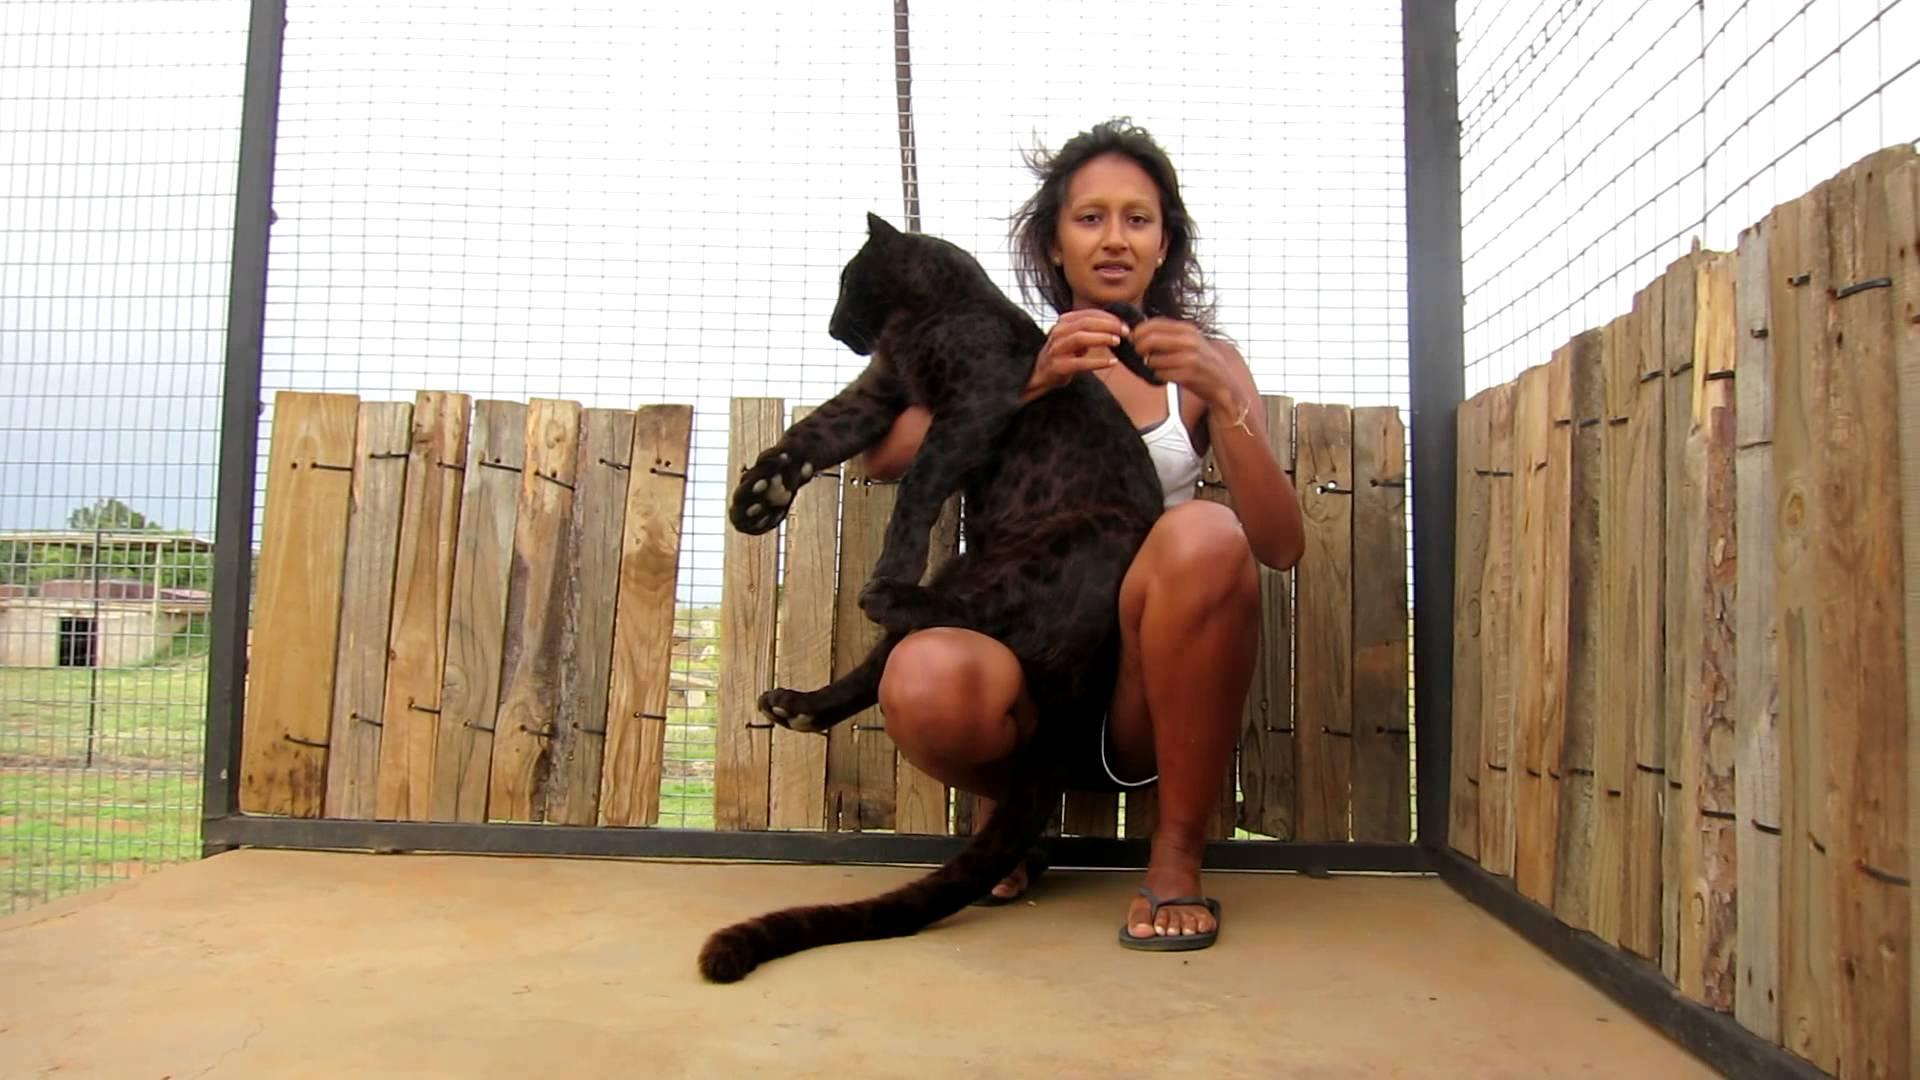 VIDEO – Leopards uzlec virsū sievietei! (Playing with Pardus the black leopard at Cheetah Experience)